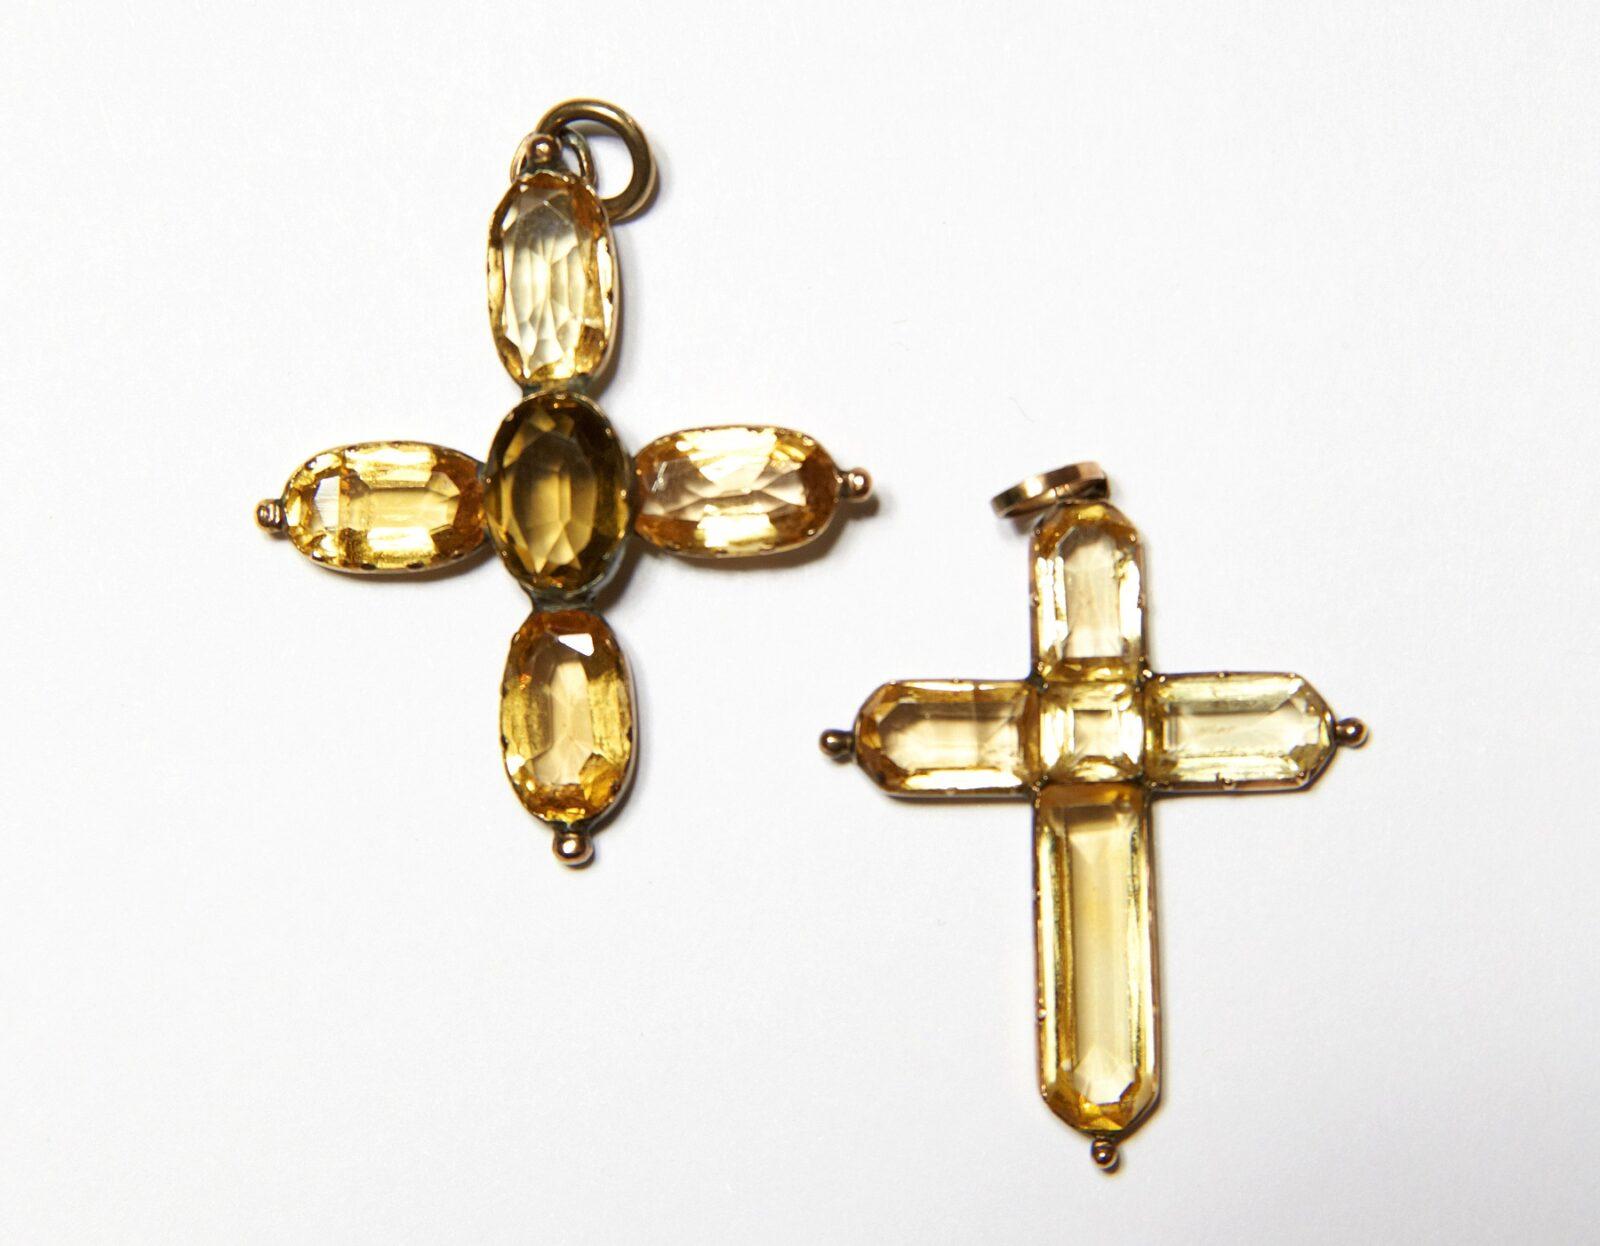 Topaz crosses belonging to Jane Austen and her sister Cassandra.